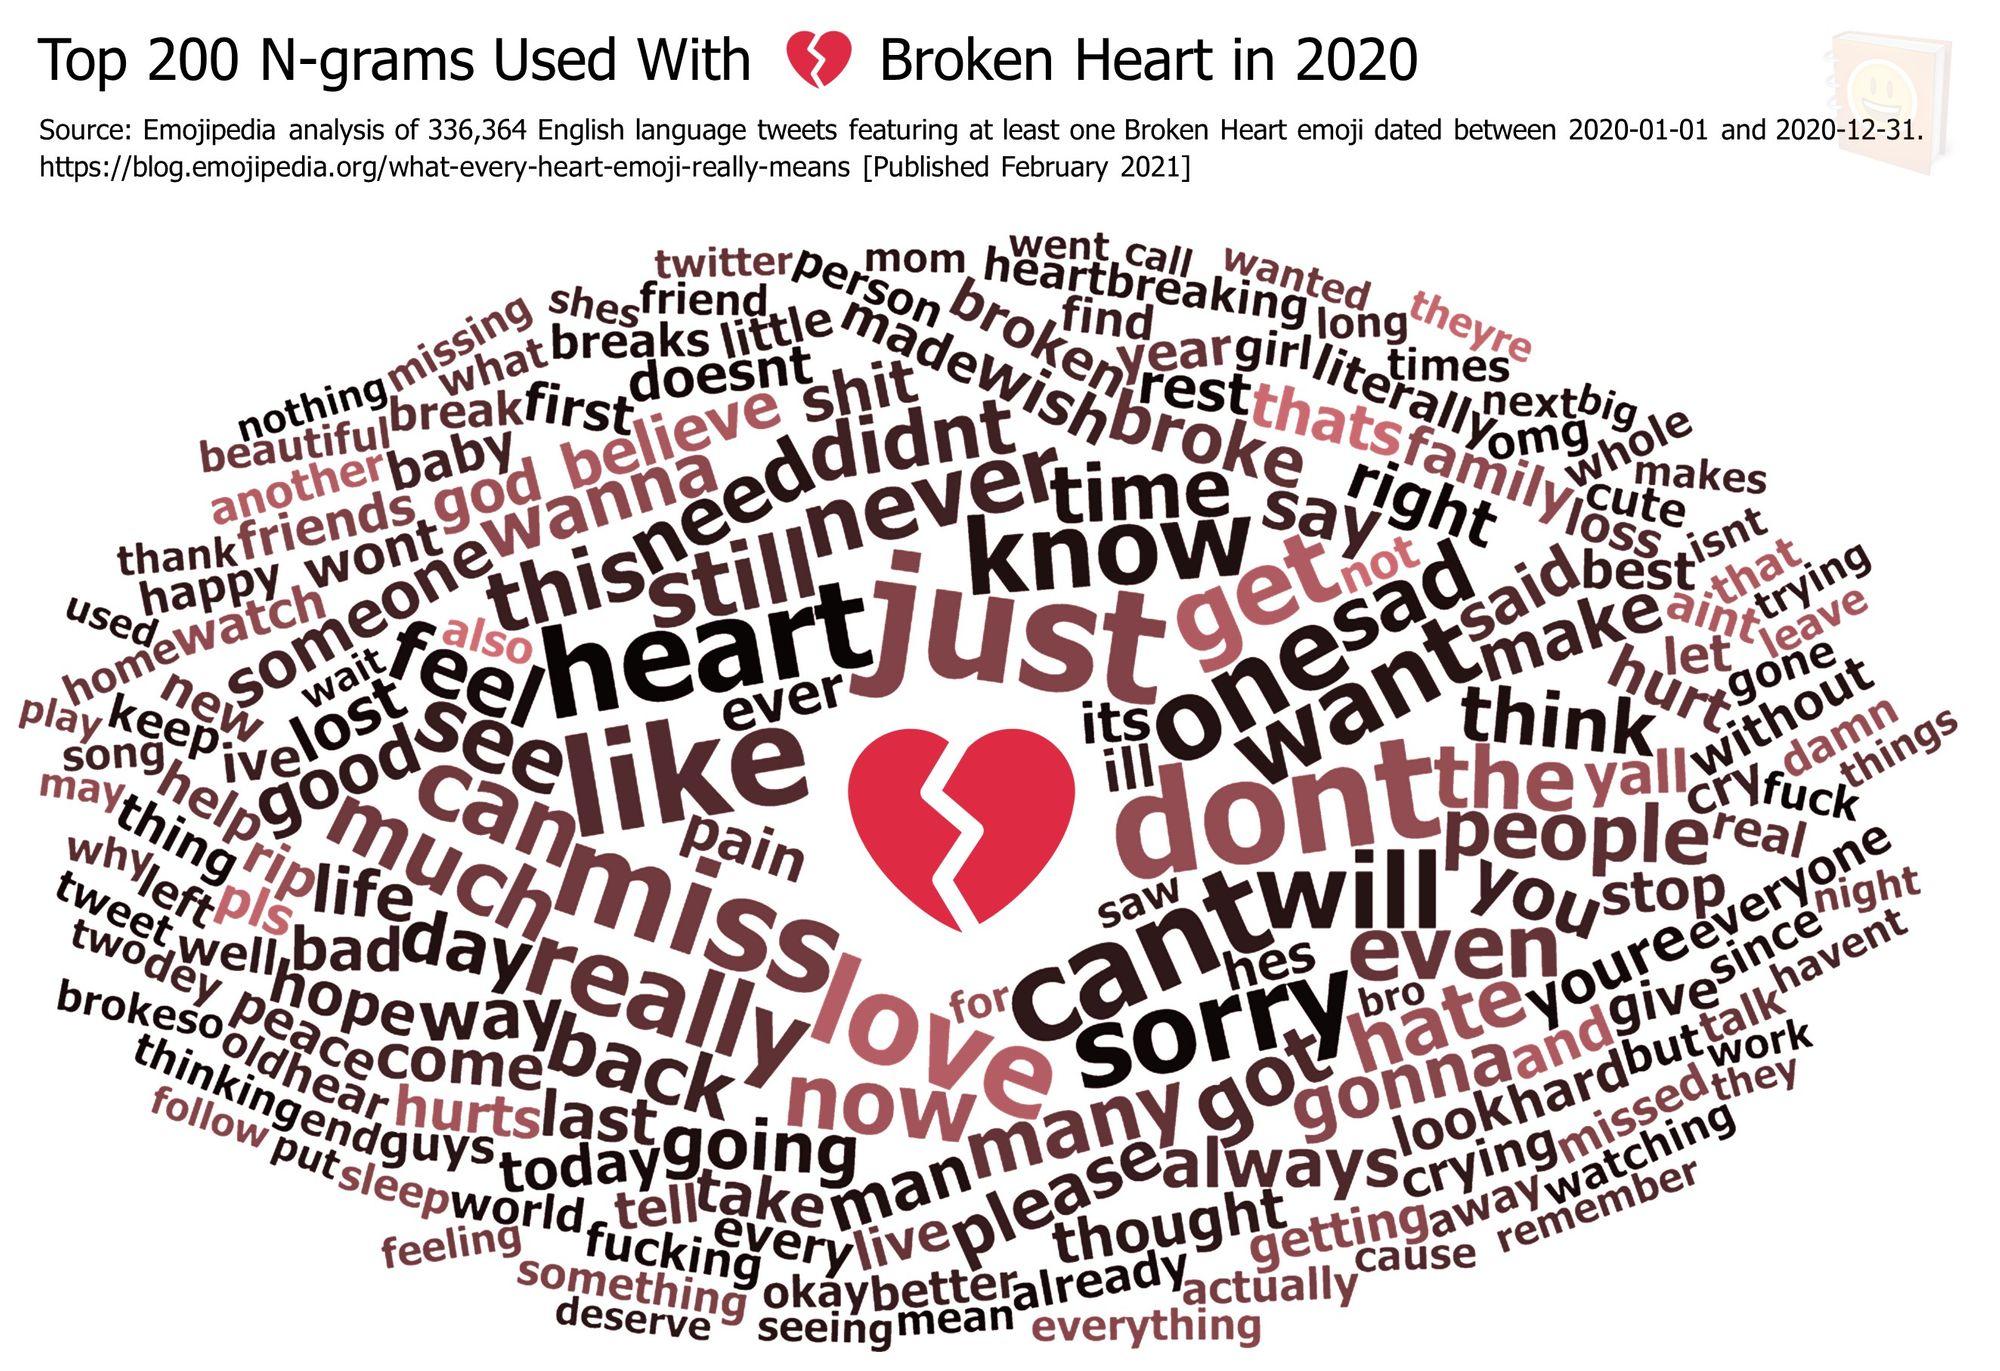 Emojipedia-Blog---What-Every-Heart-Emoji-Really-Means---Top-200-N-grams-Used-With-------Broken-Heart-in-2020